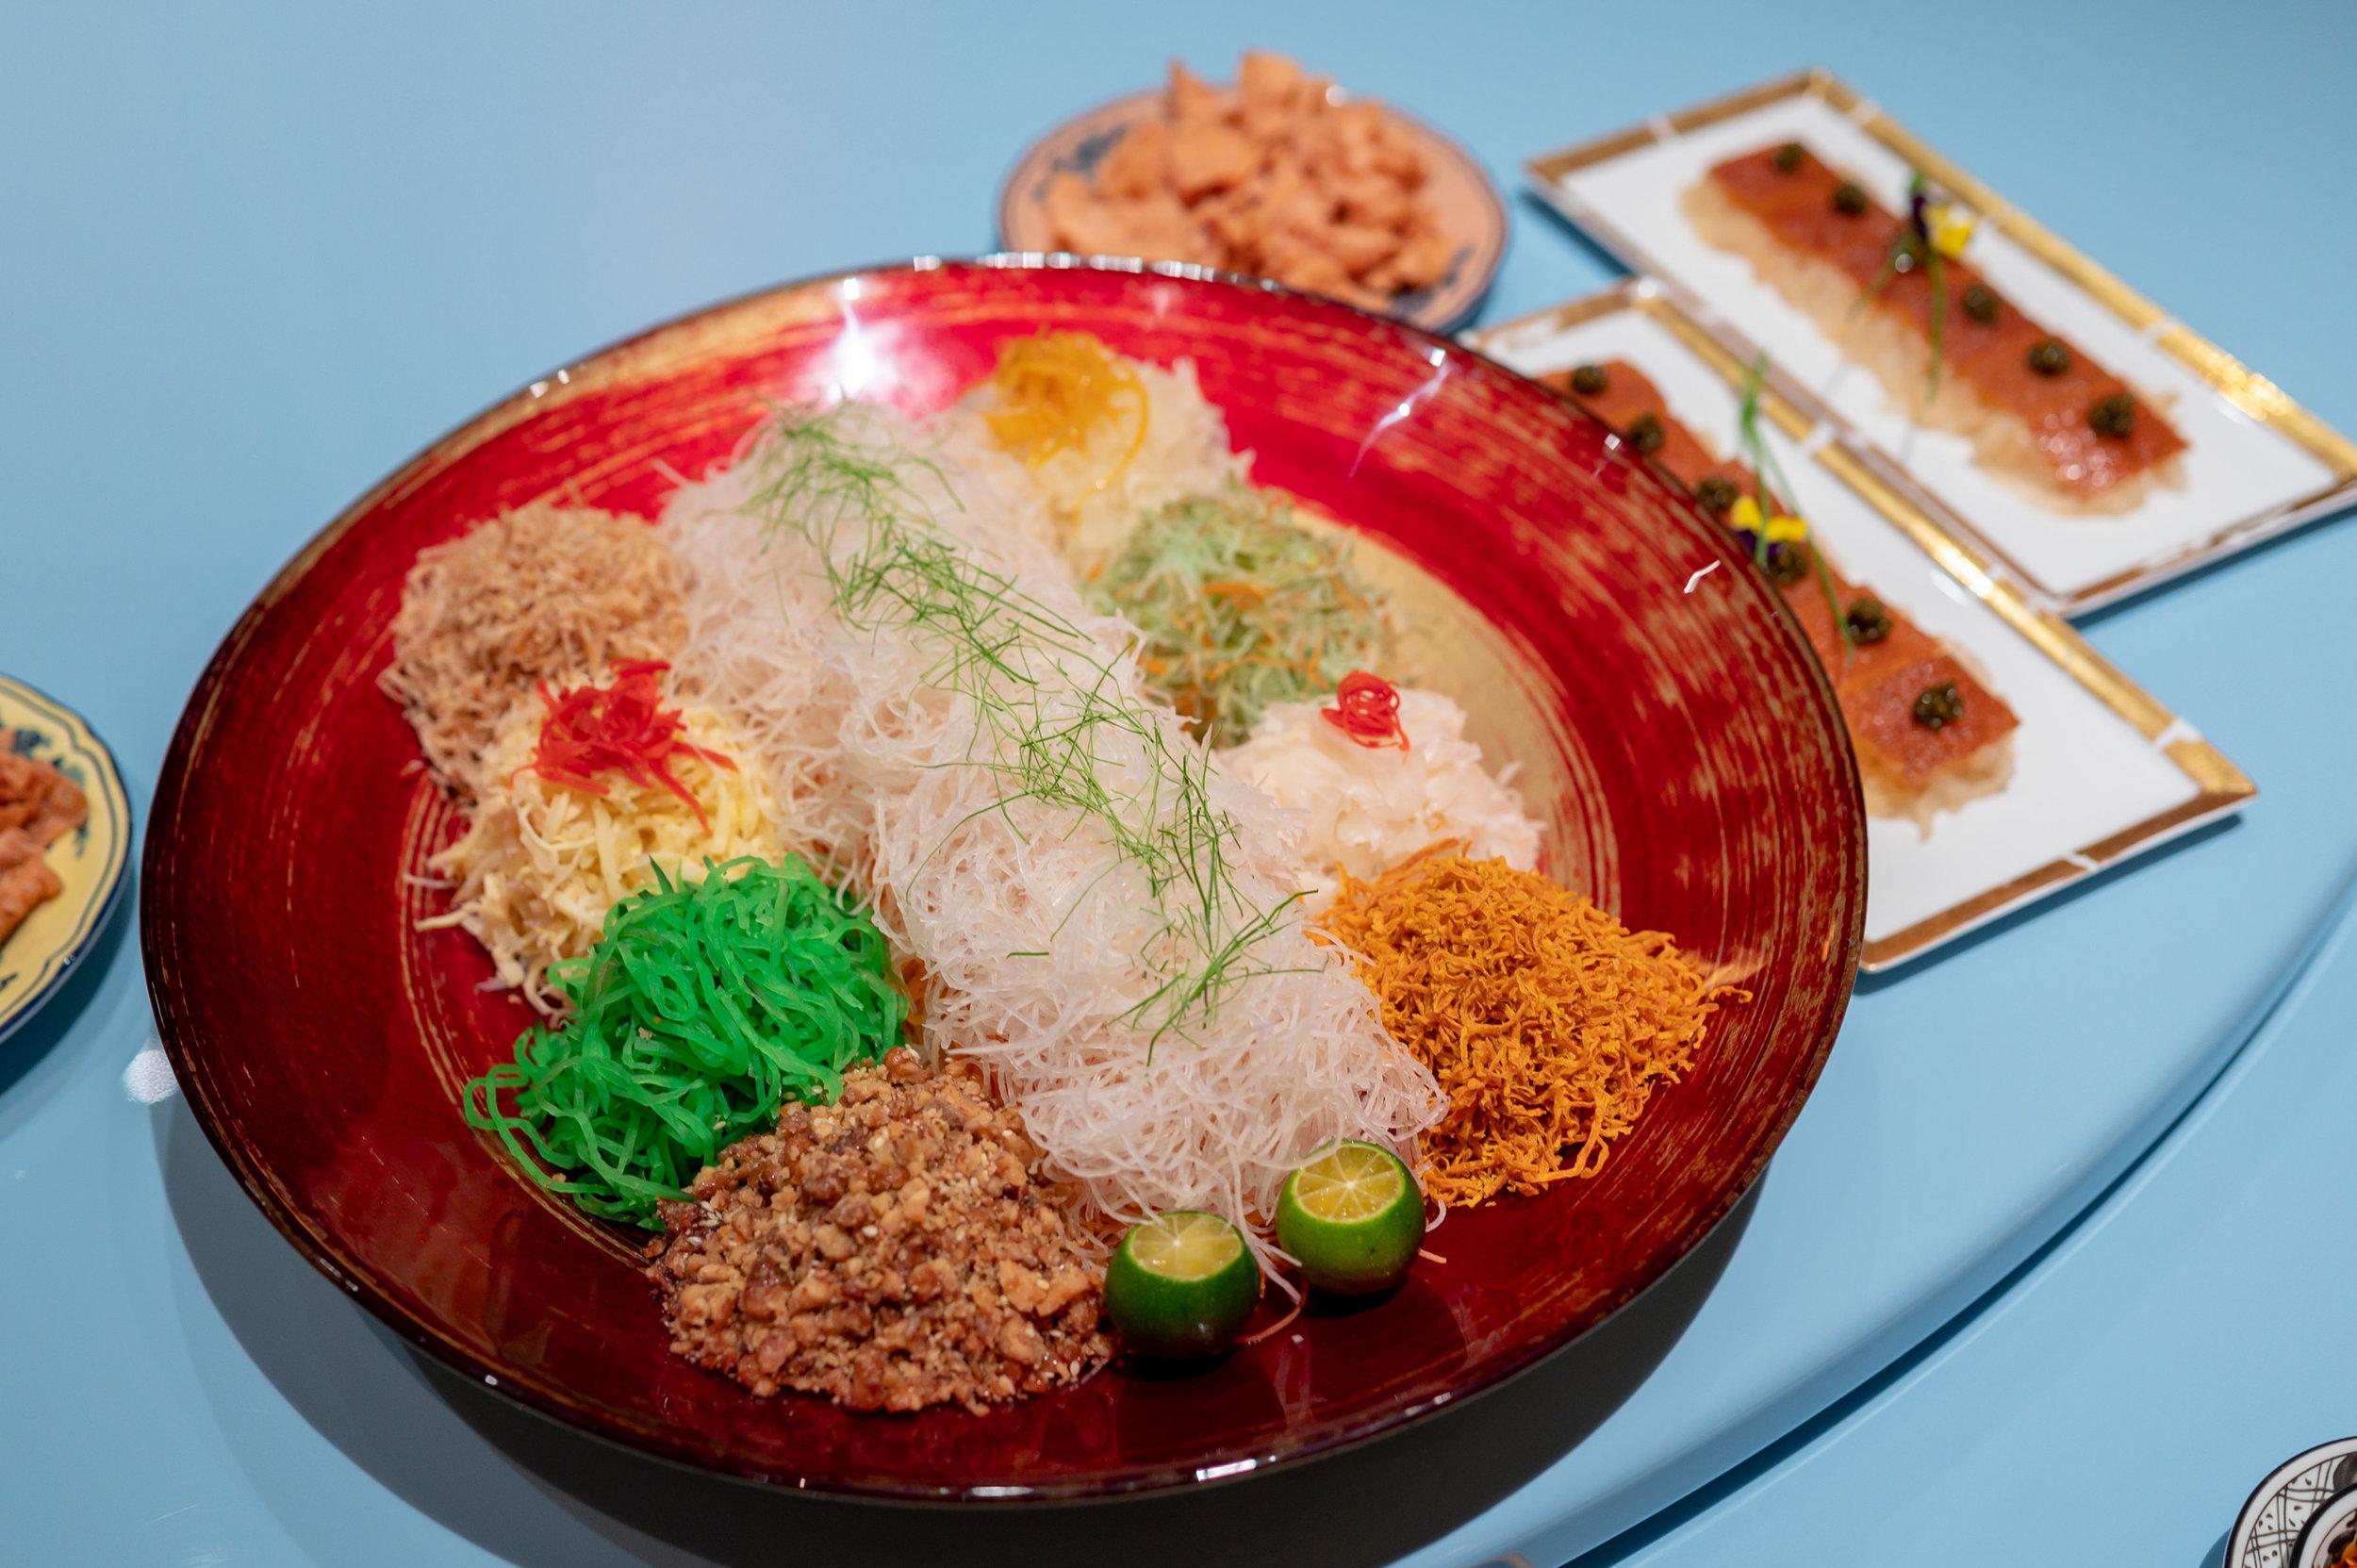 Suckling Pig, Black Caviar, Jelly Fish Yu Sheng  Summer Pavilion - The Ritz-Carlton, Millenia Singapore